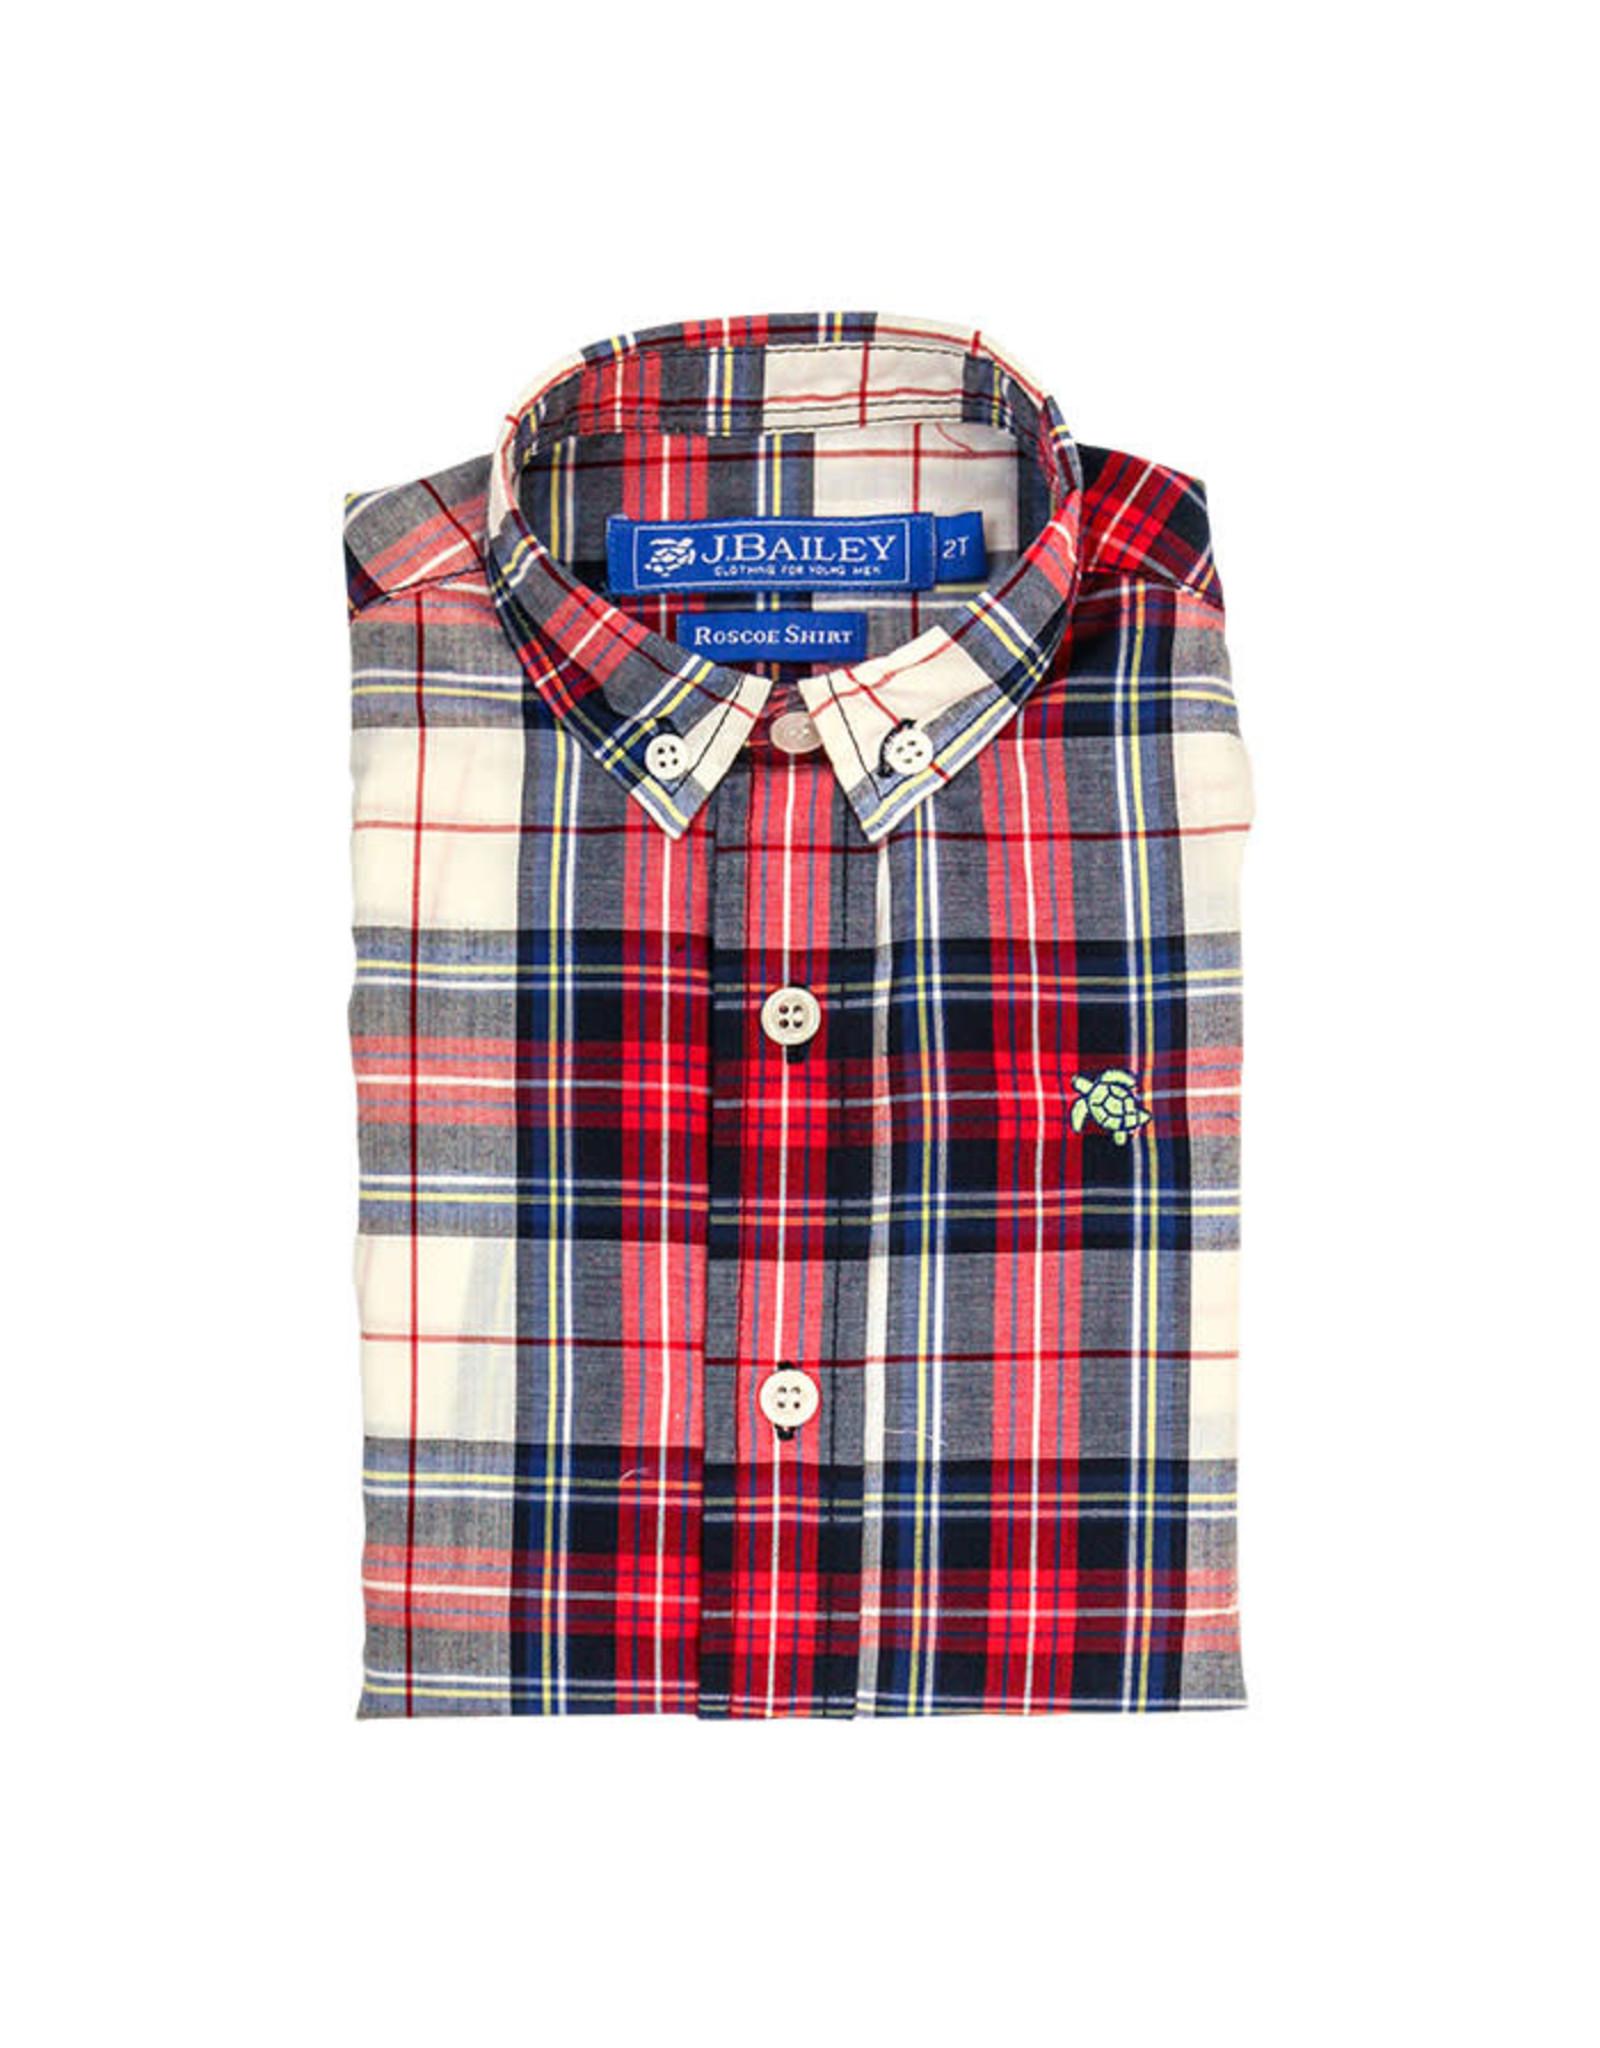 The Bailey Boys Shaw Plaid Button Down Shirt